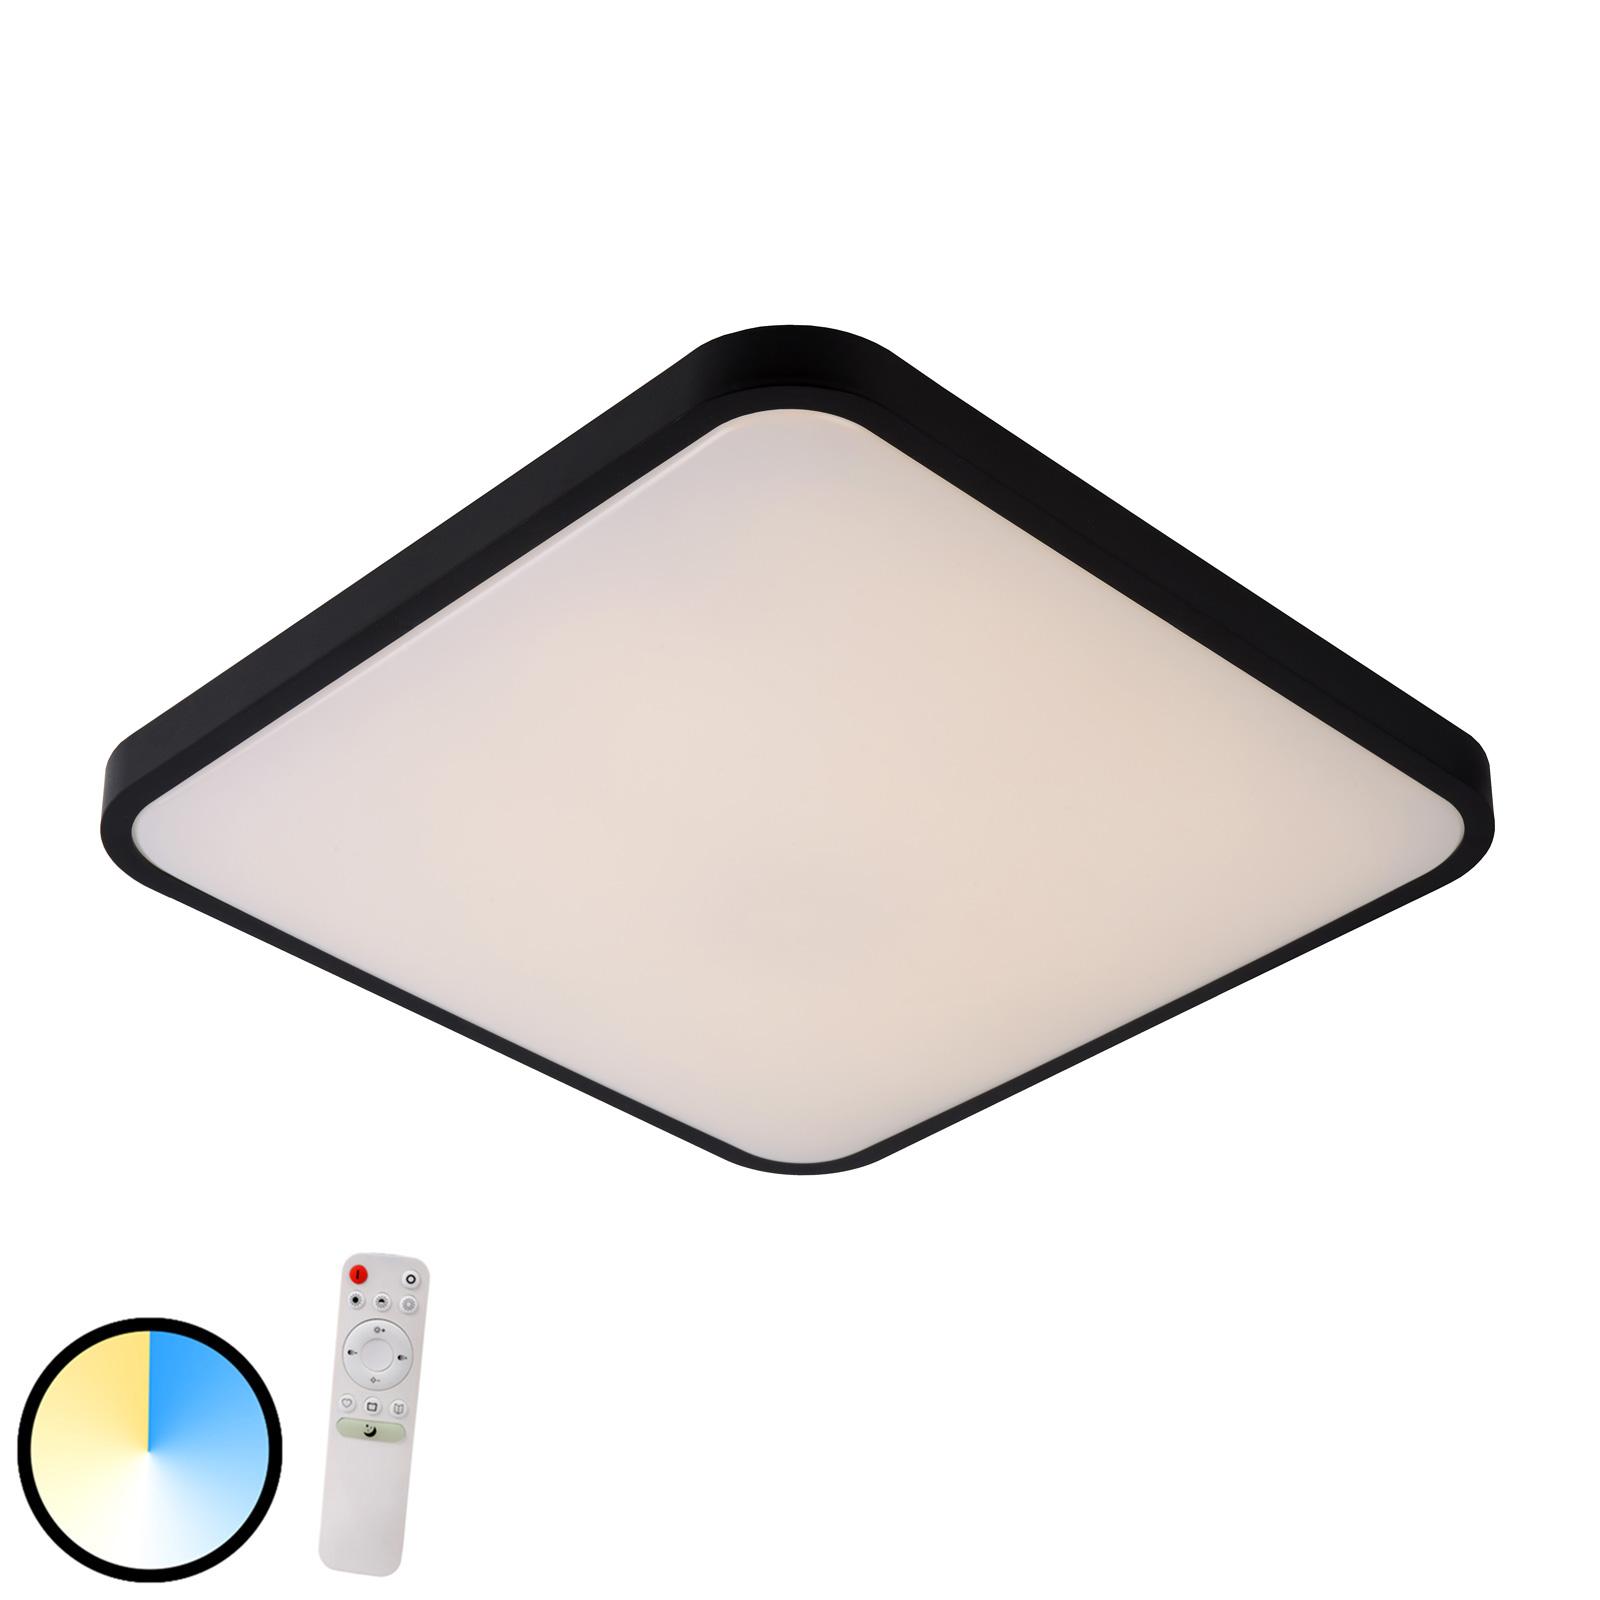 Polaris LED-taklampe 43,4 x 43,4 cm